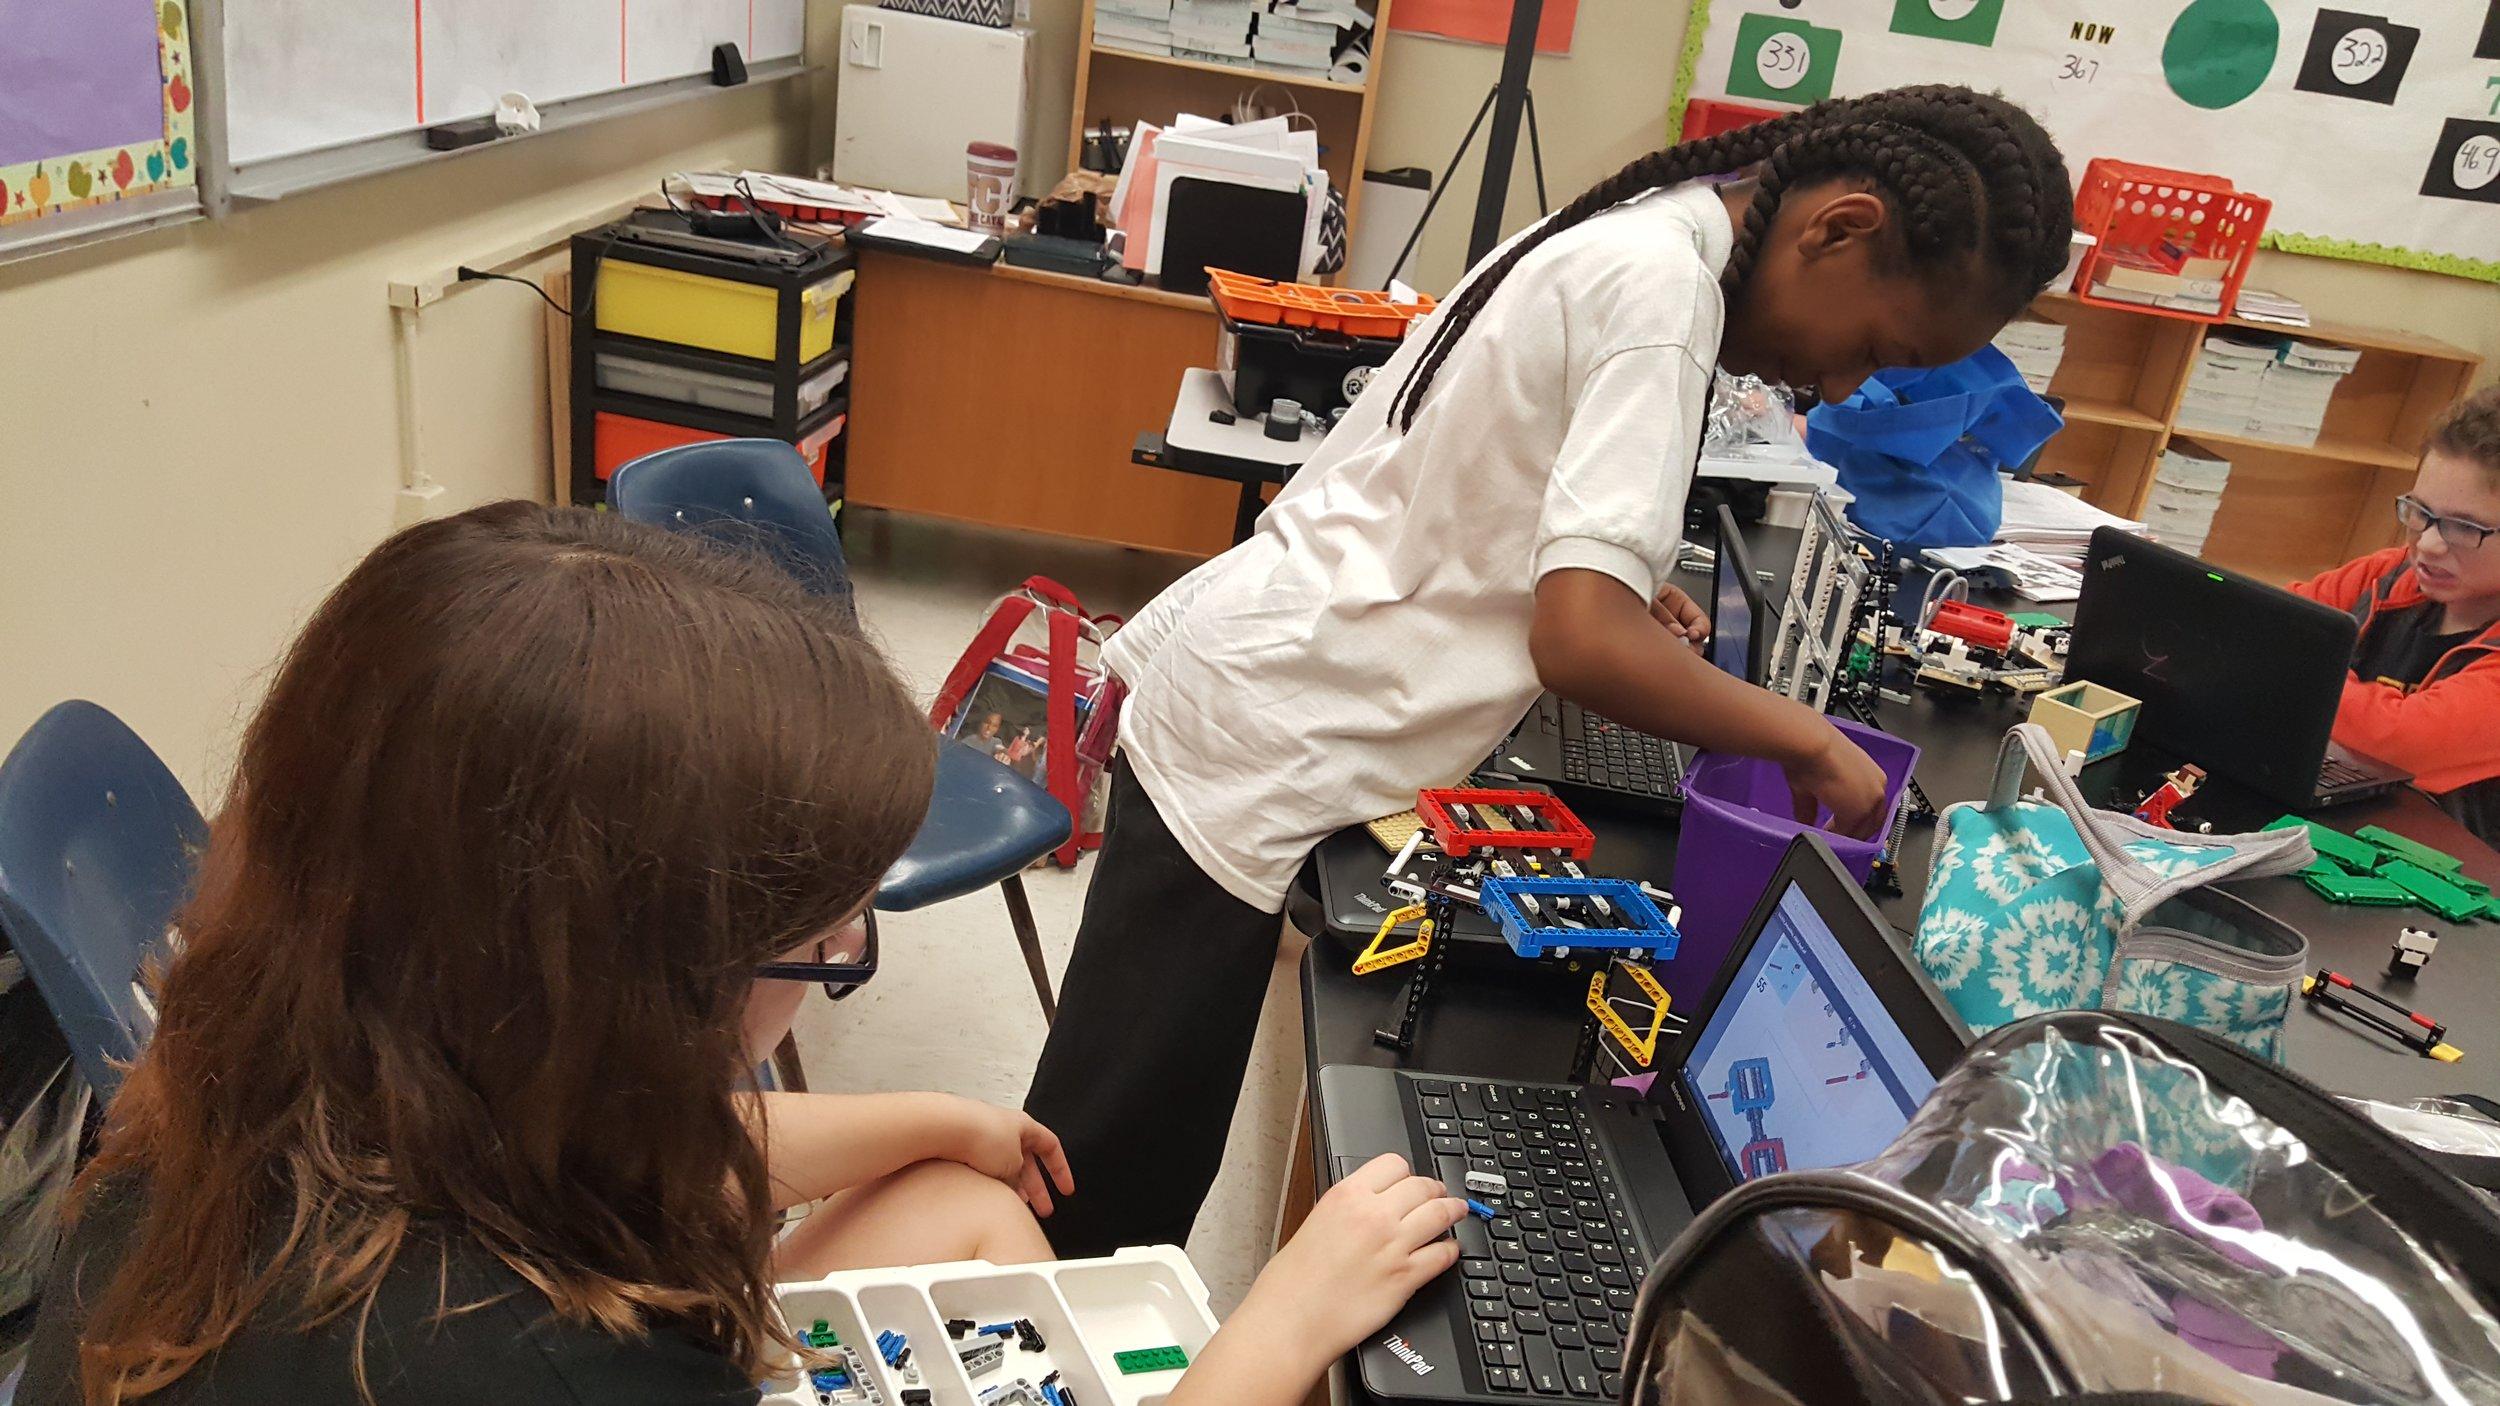 2017: Fort Caroline Middle Boys & Girls Club Robotics Program